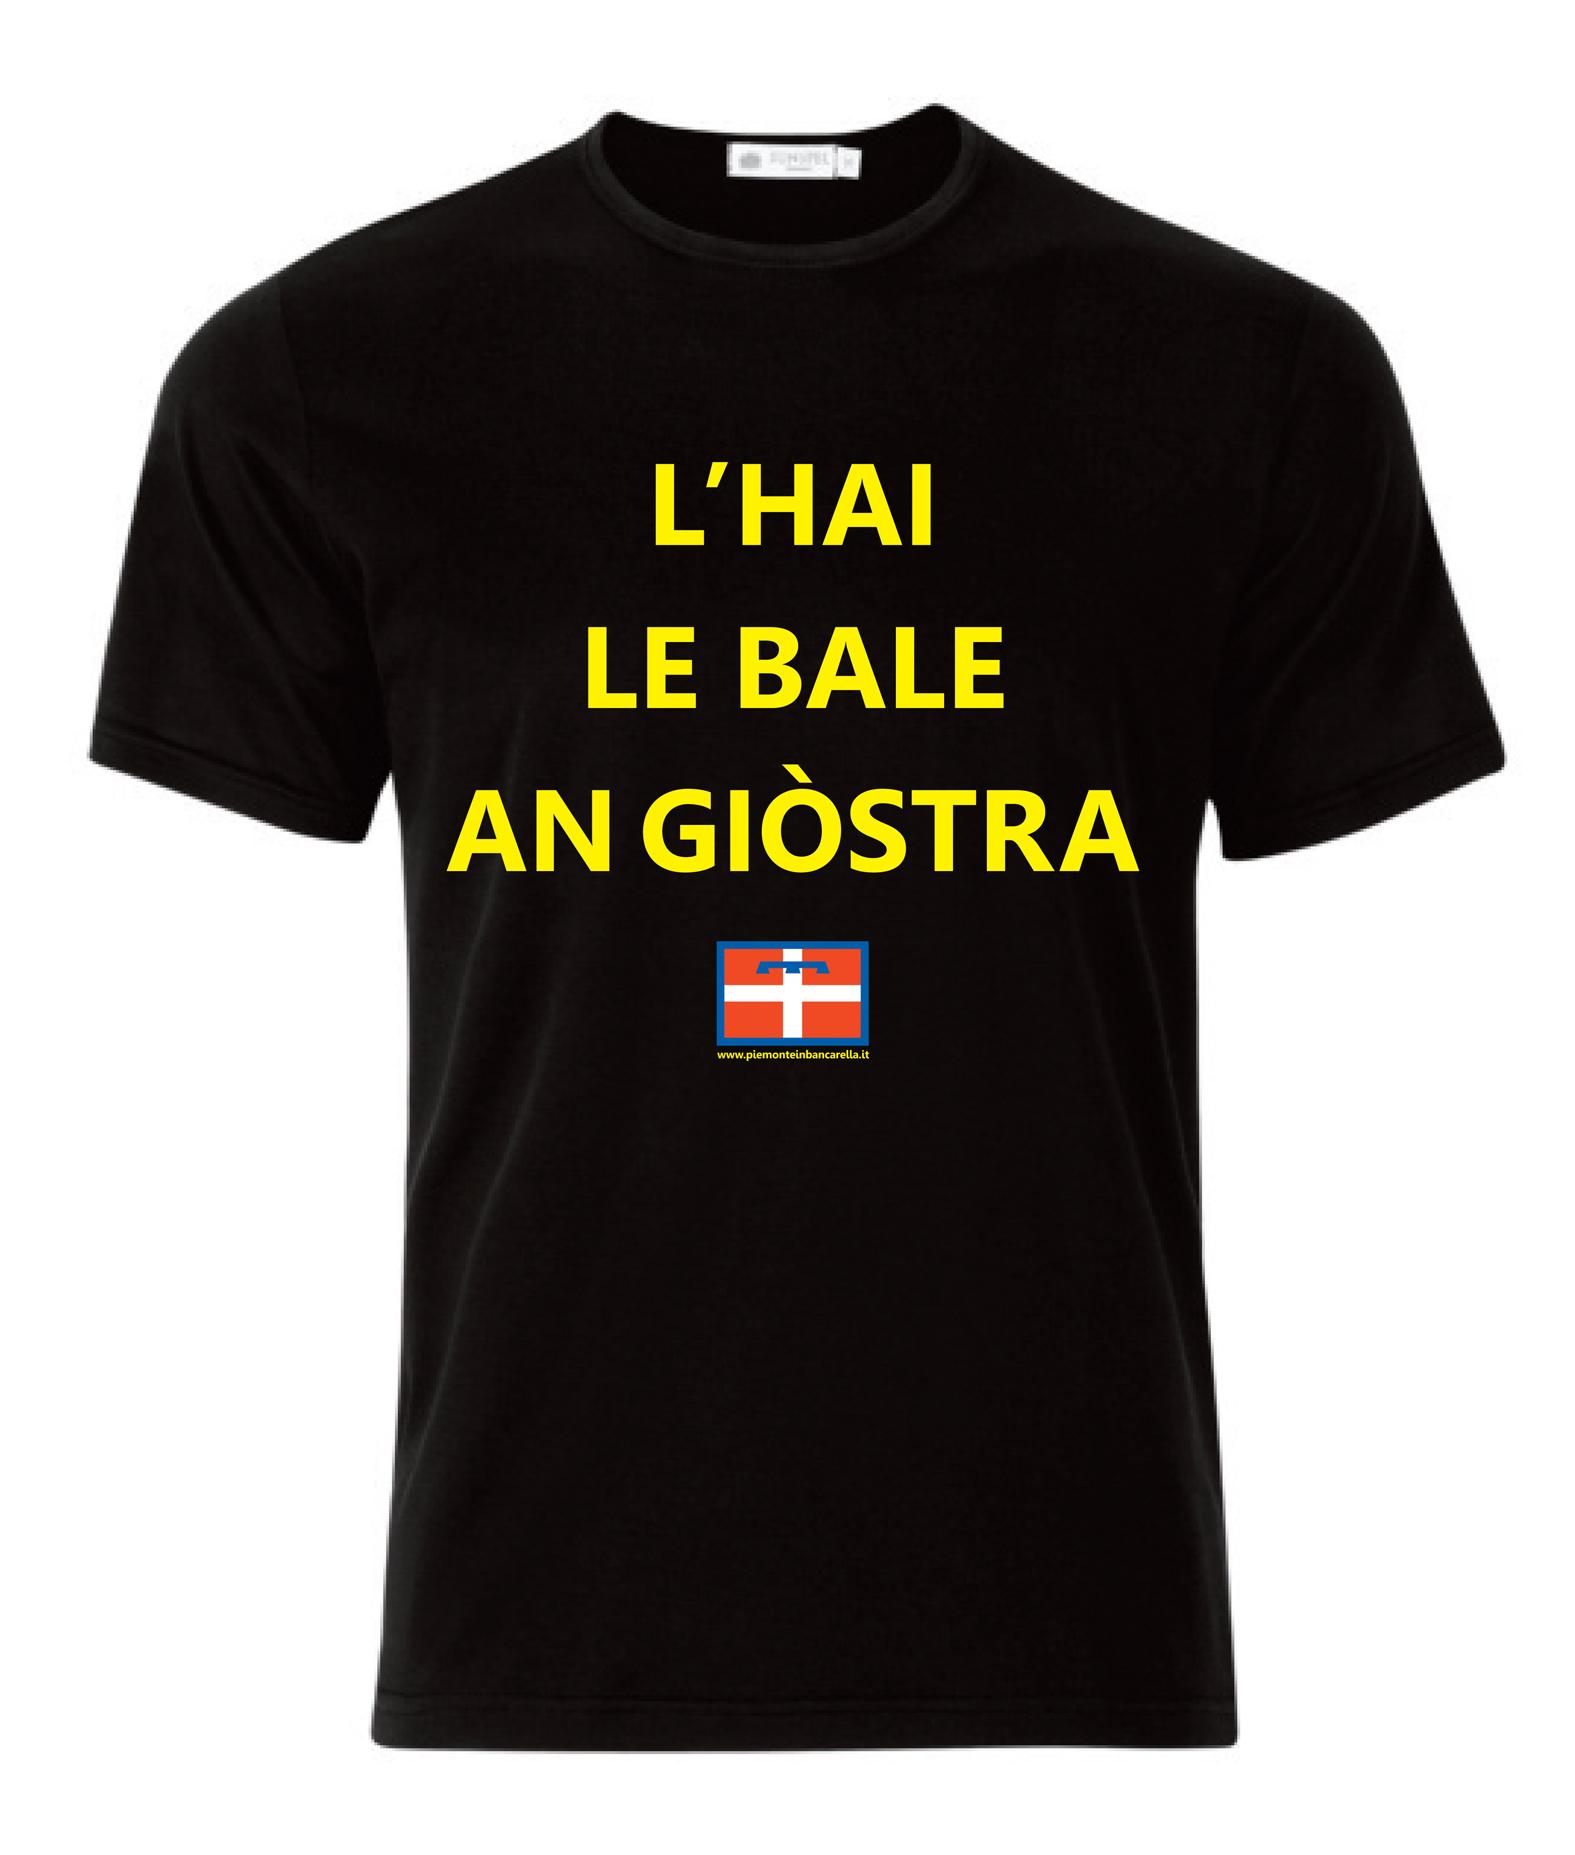 T-Shirt in Piemonteste